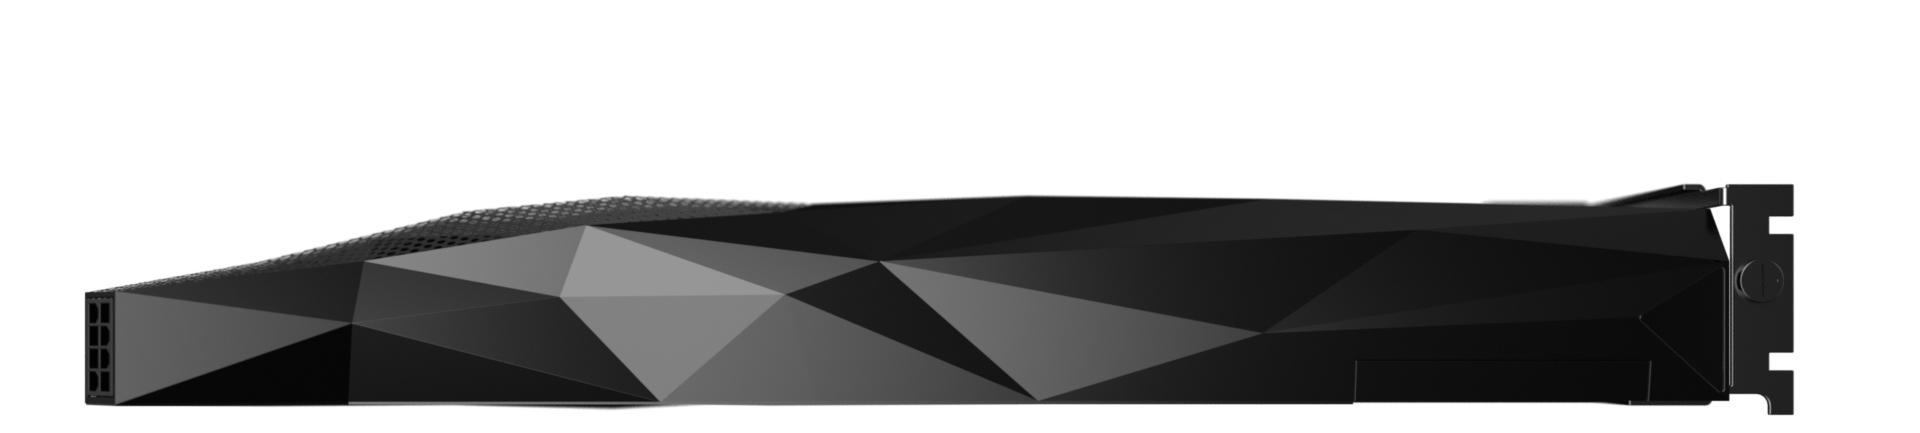 VISION Alpha GPU side view